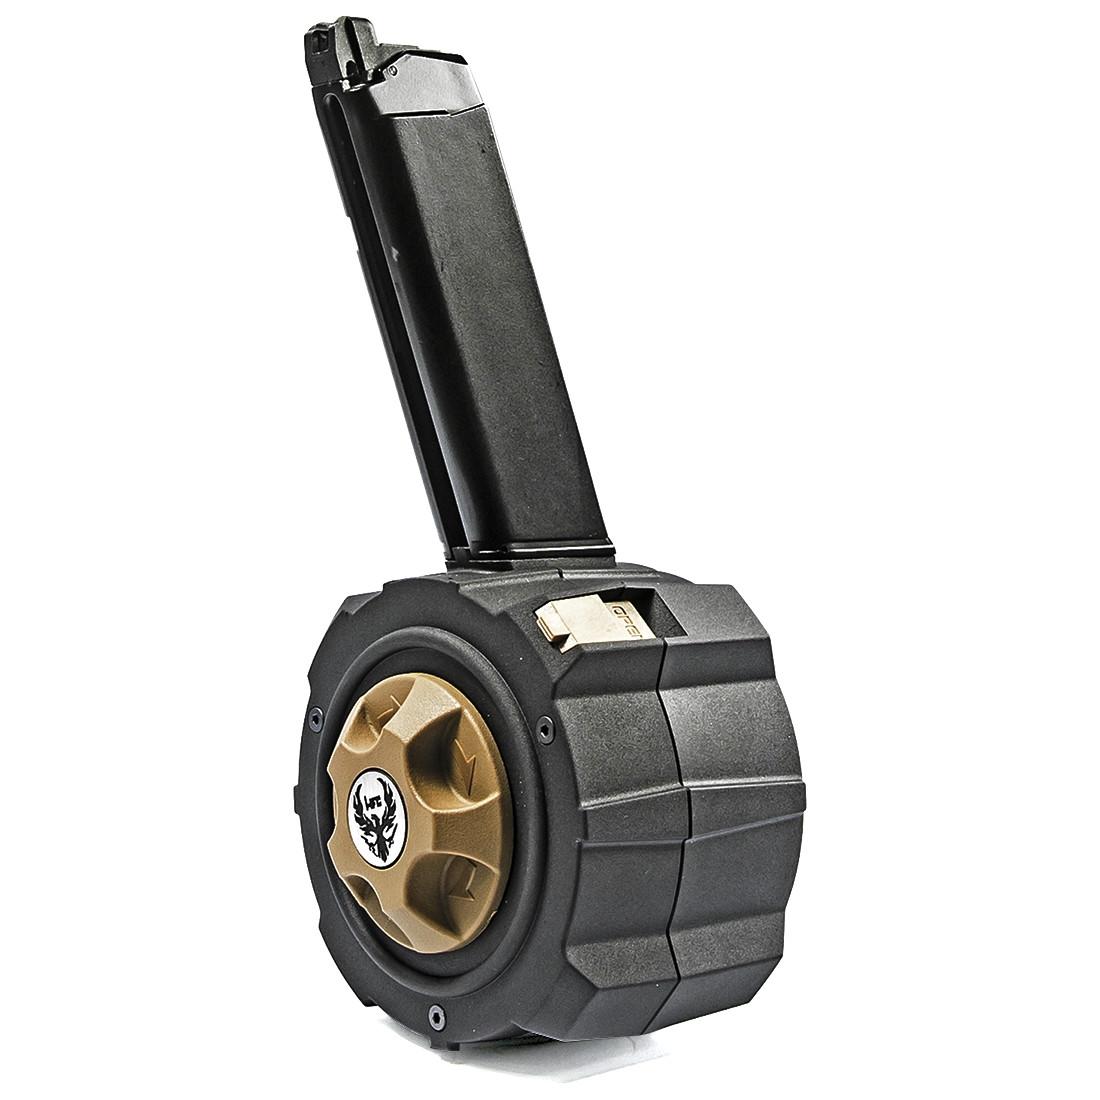 HFC Chargeur DRUM 145 coups pour Glock 17, 18